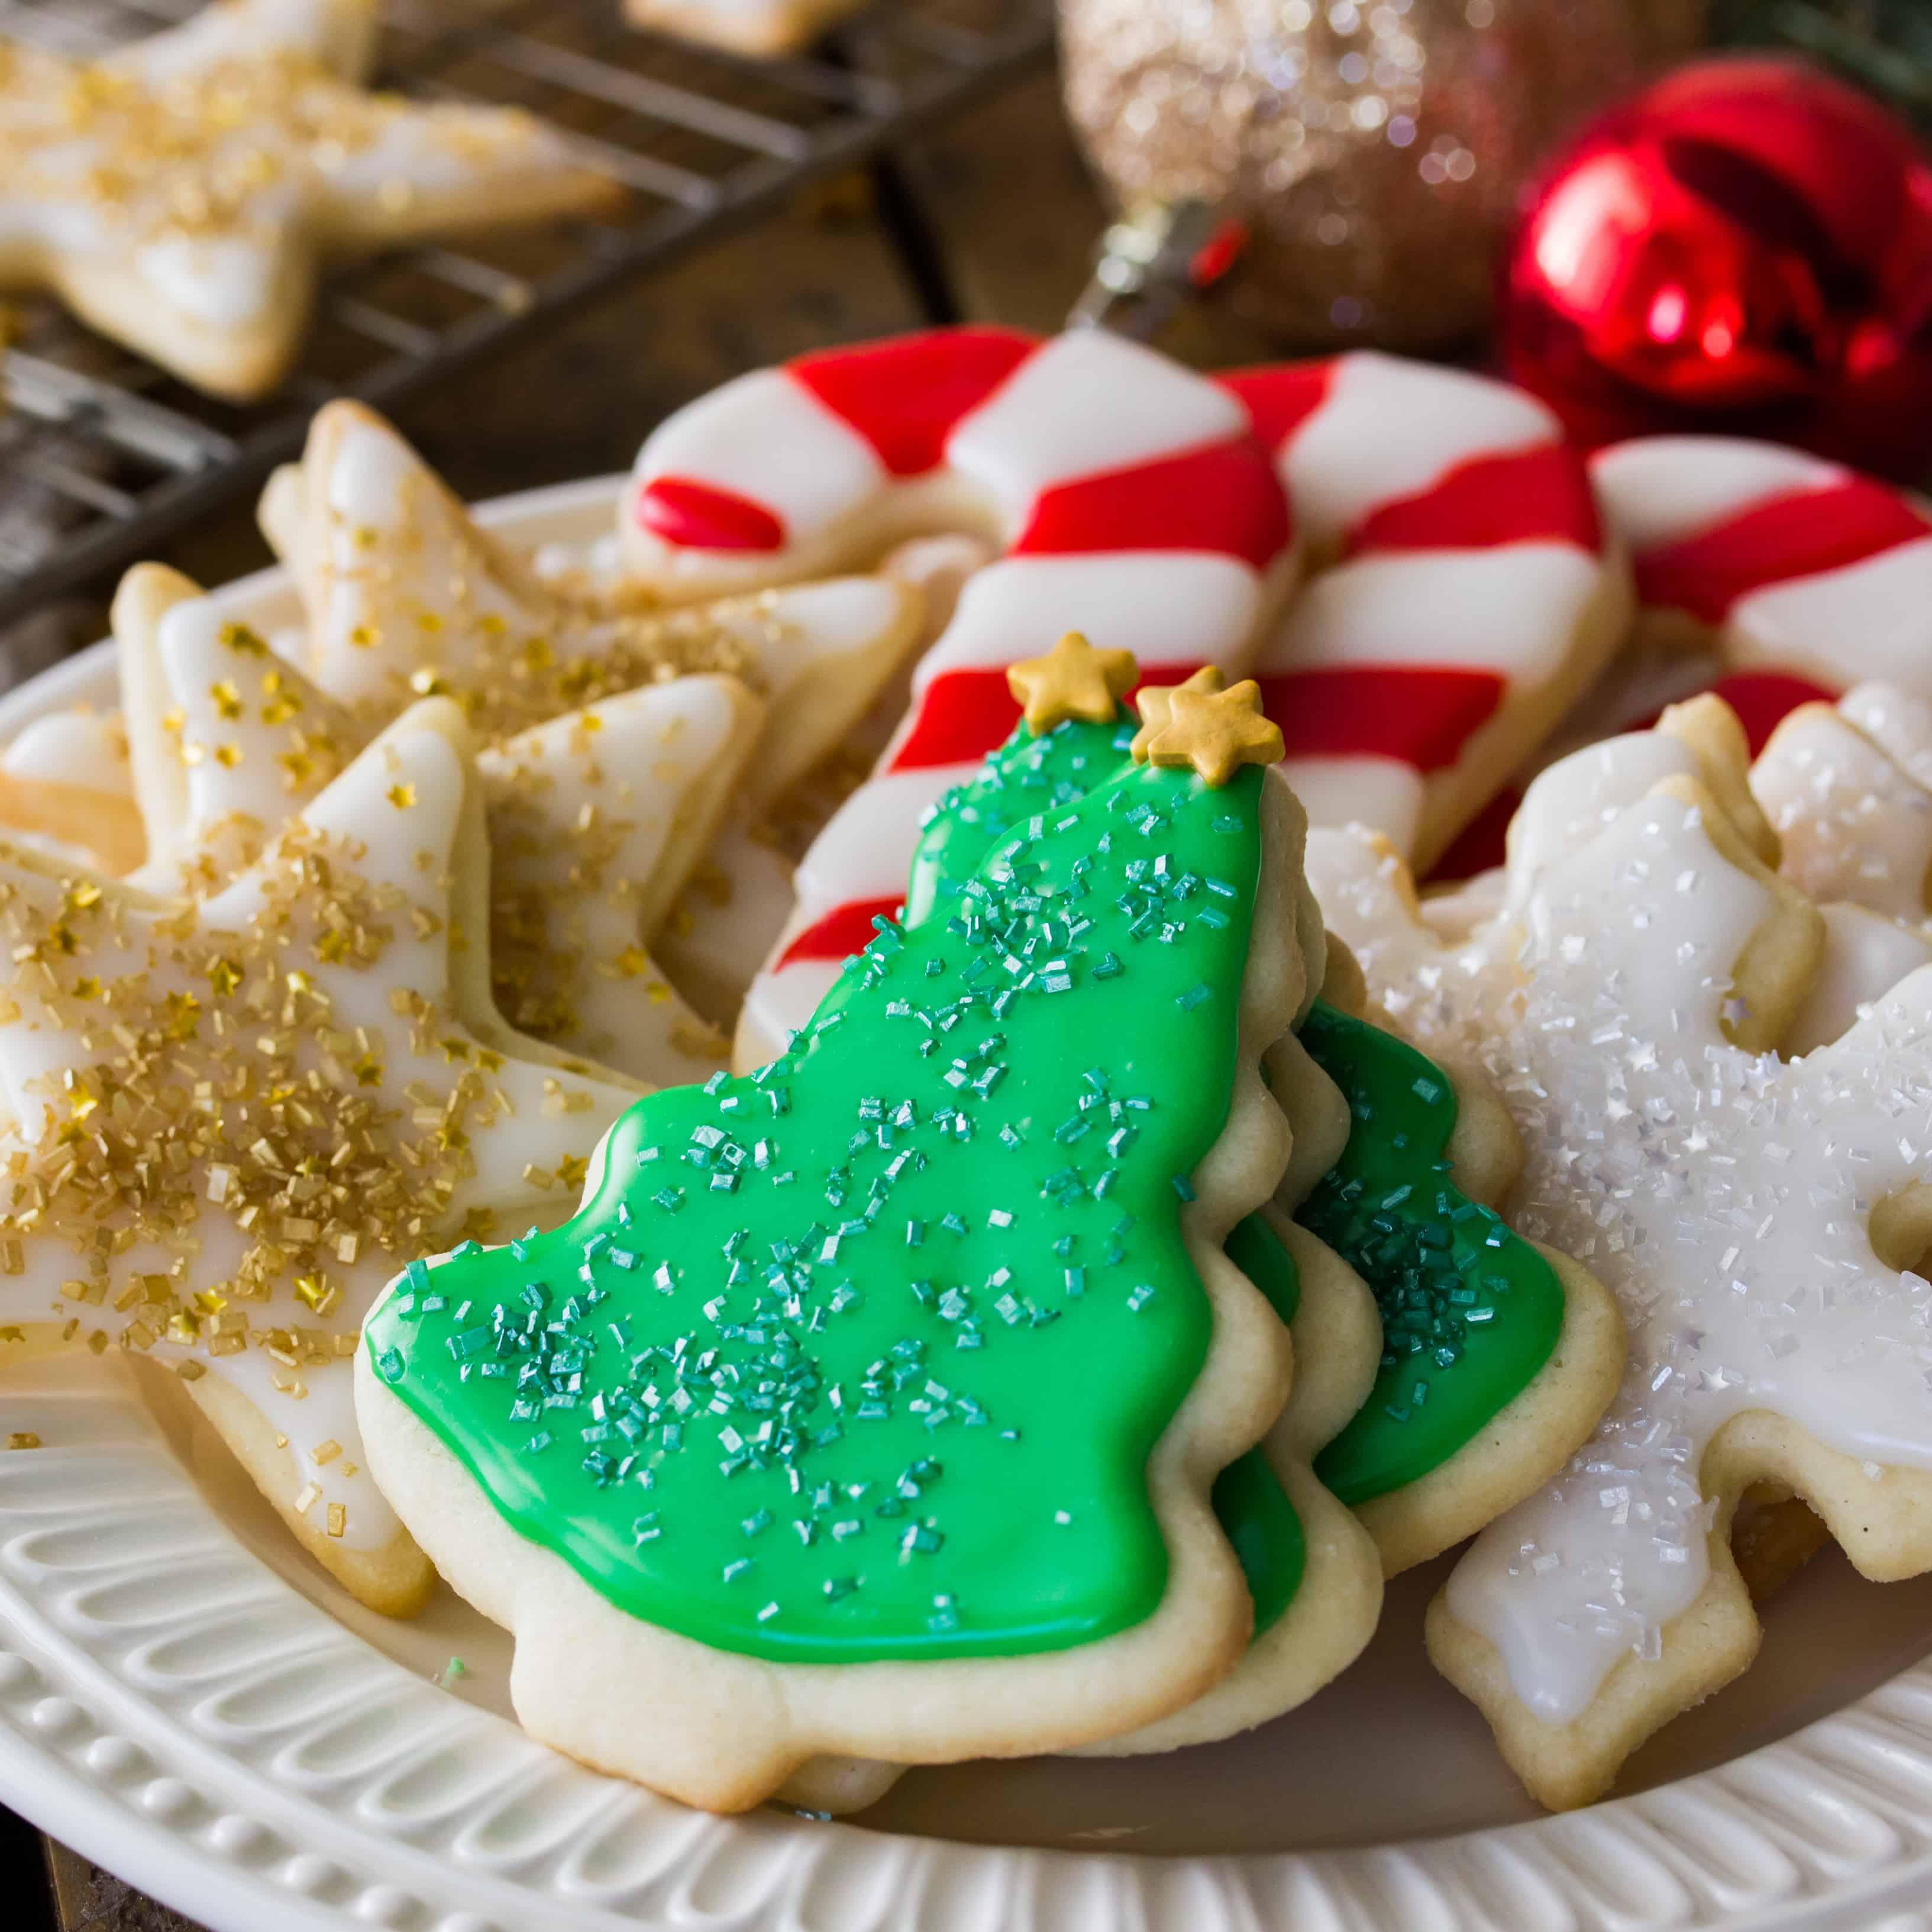 10 Amazing Easy Sugar Cookie Decorating Ideas easy sugar cookie recipe with frosting sugar spun run 2021